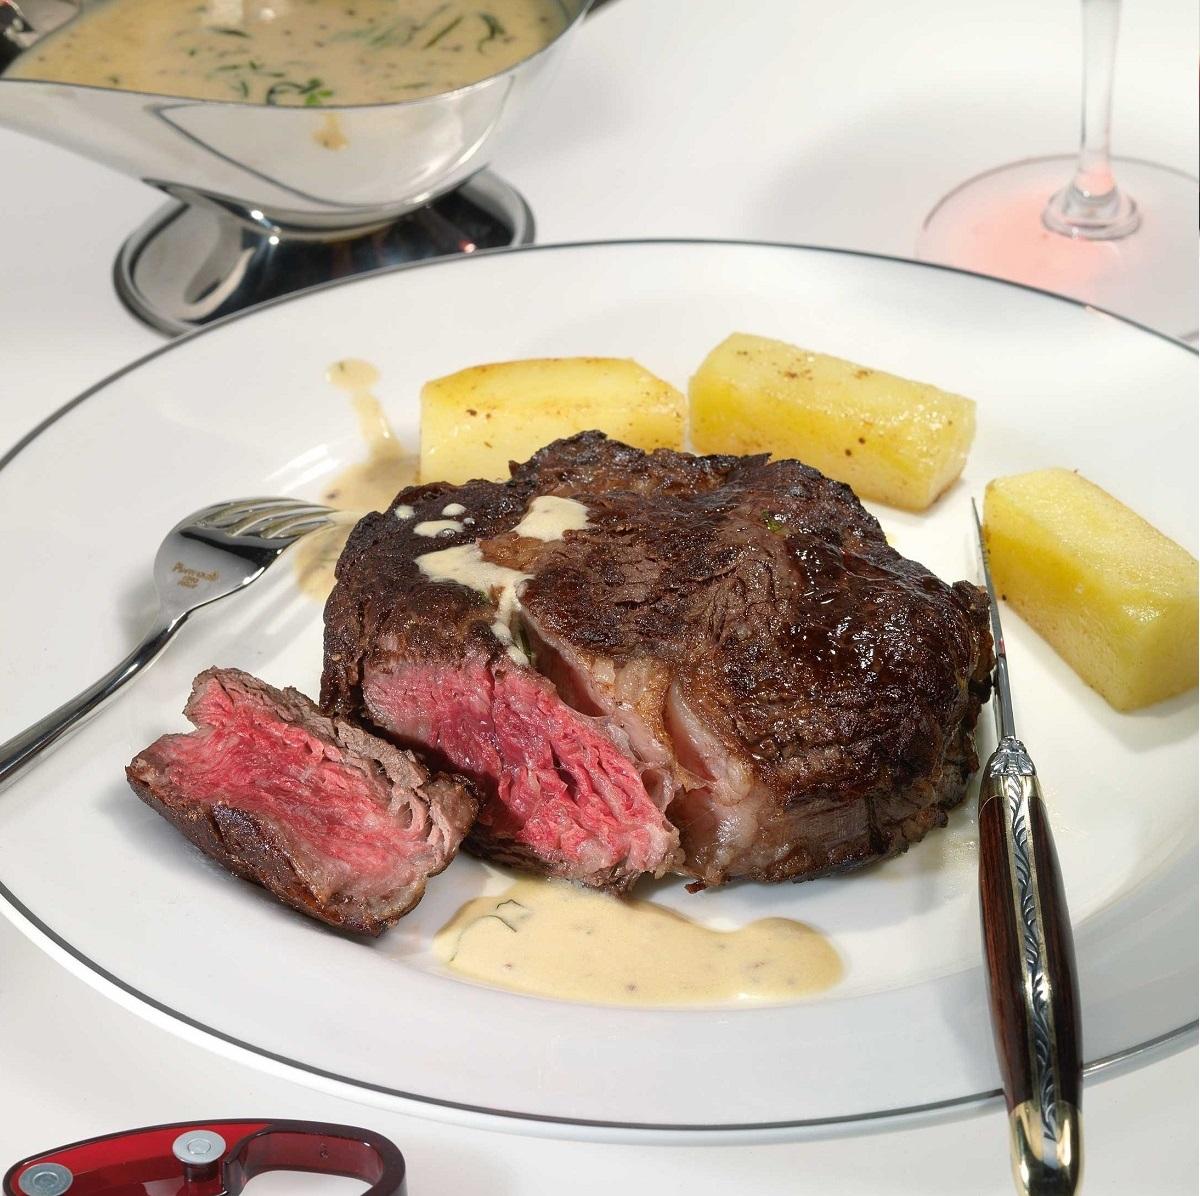 Beef steak with white port wine sauce